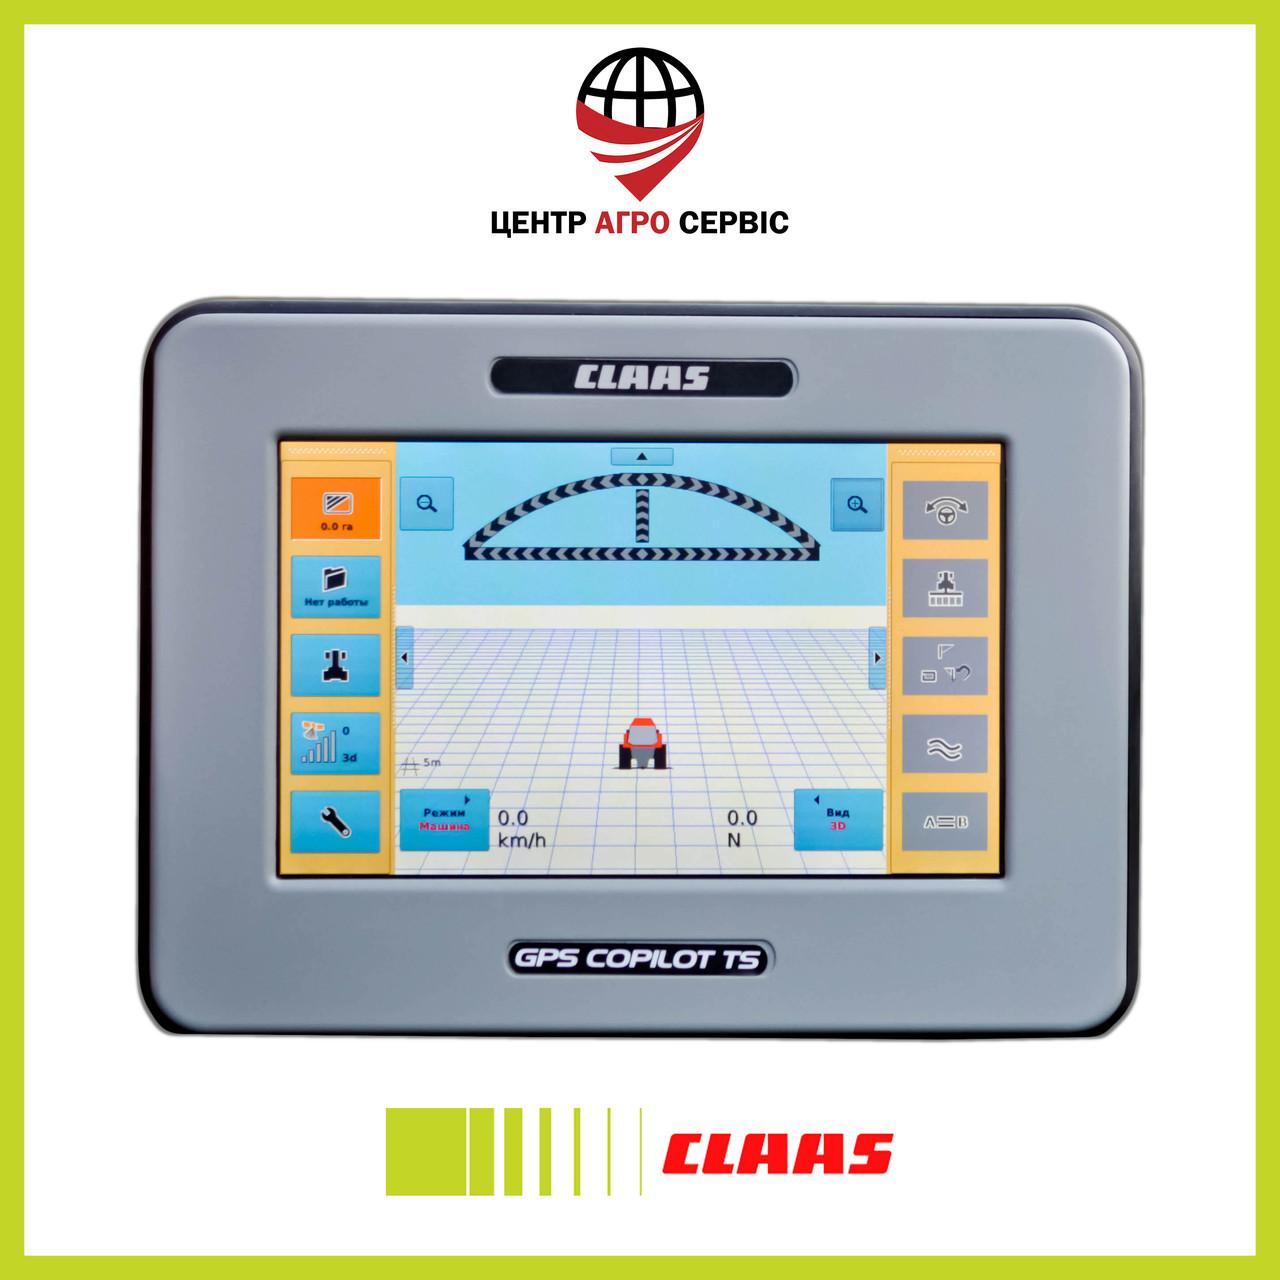 Gps навигатор для трактора (навигатор для поля, сельхоз навигатор)  Клас копилот тс